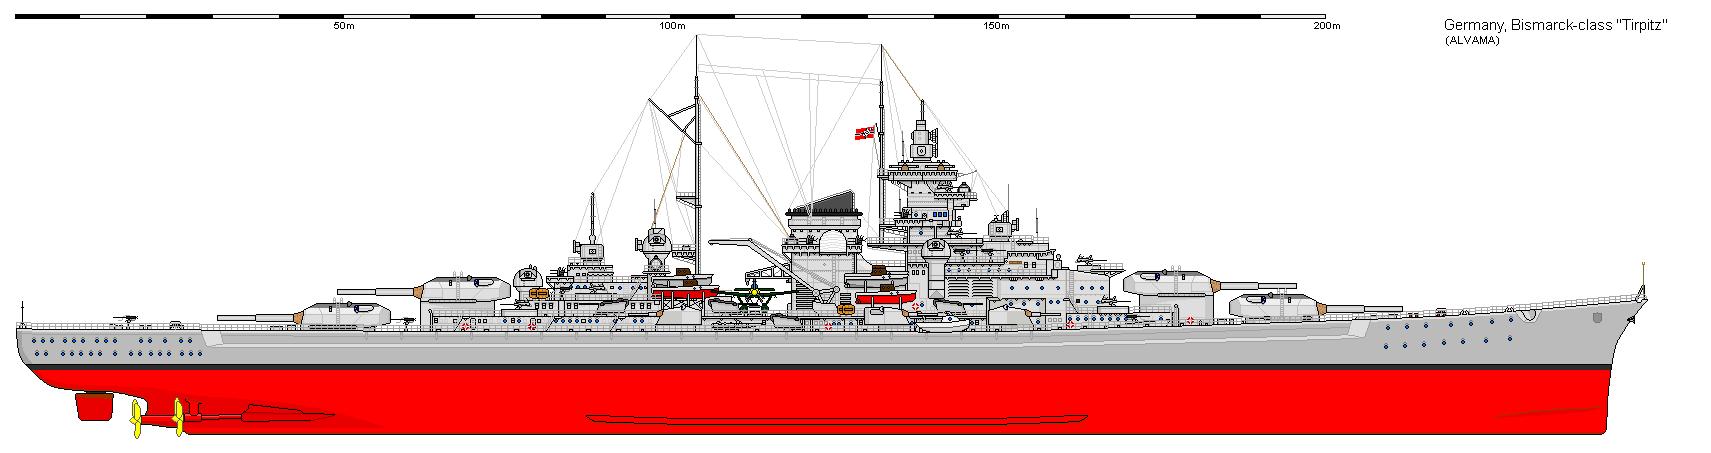 Germany/BB Tirpitz